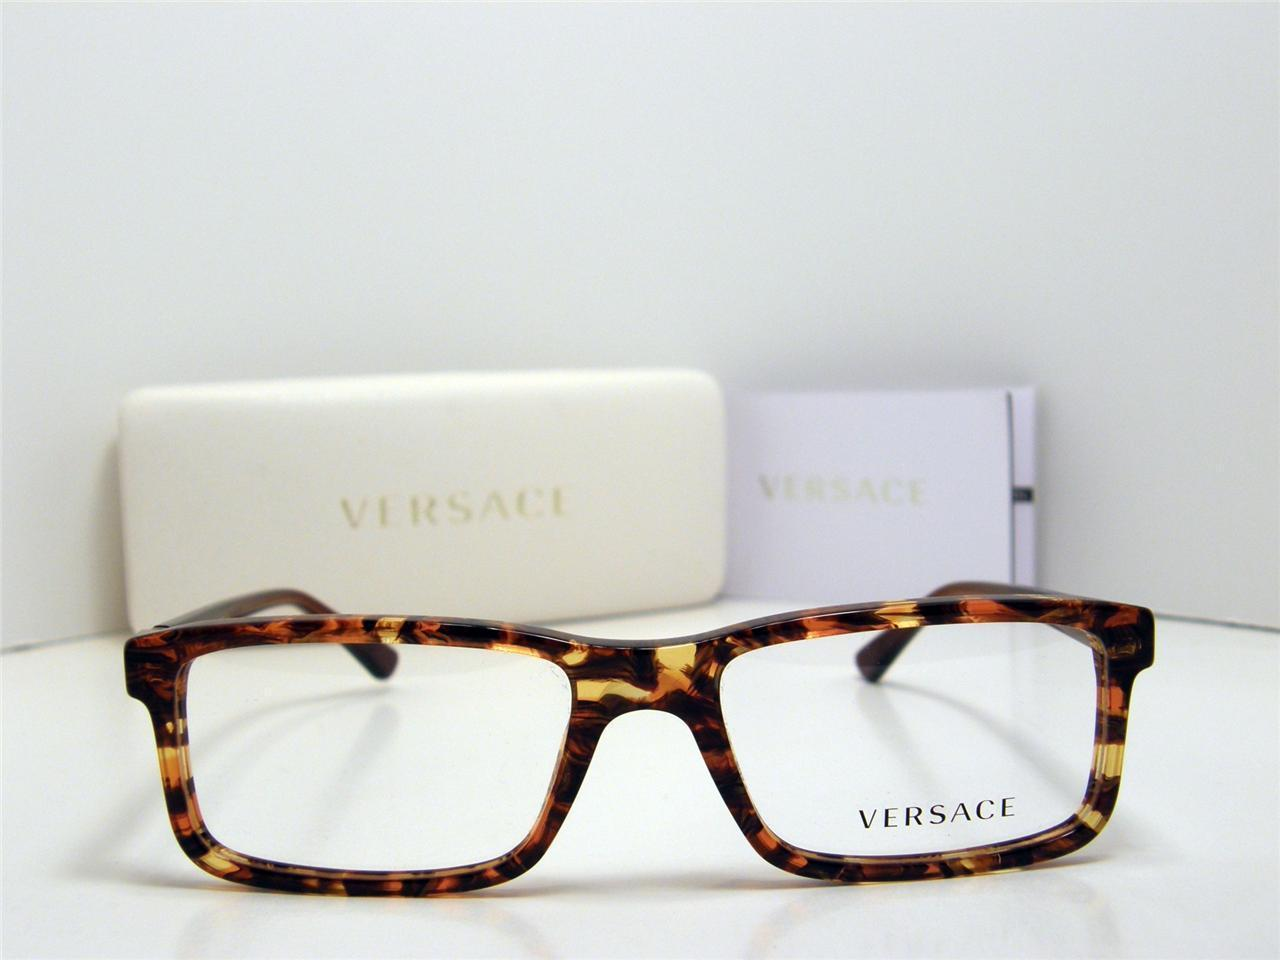 d230d64e767d Hot New Authentic Versace Eyeglasses VE 3171 and 50 similar items. S l1600